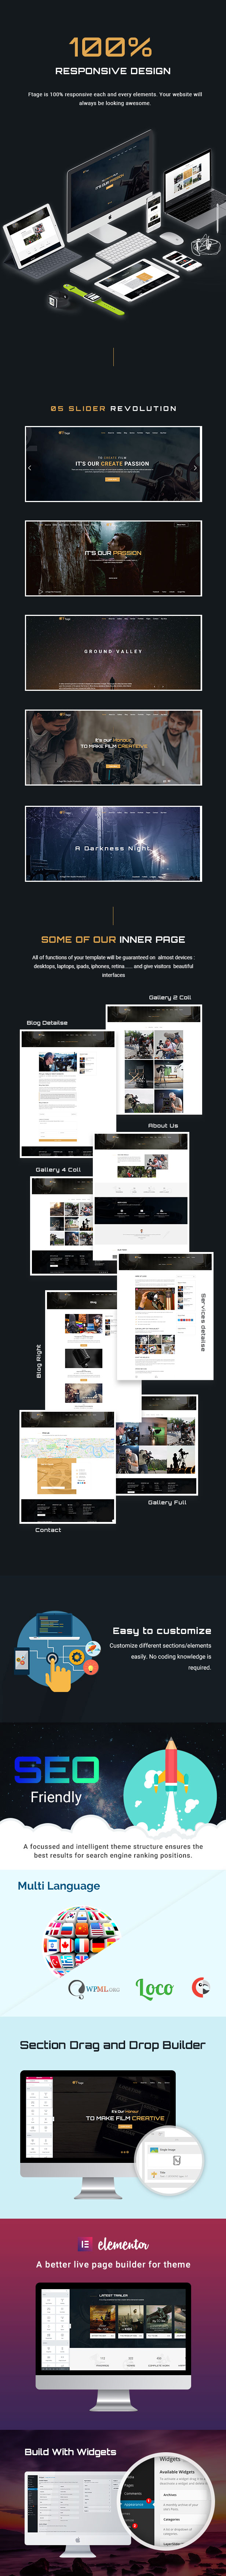 Movie Production & Film Studio WordPress Theme - Ftage - 2